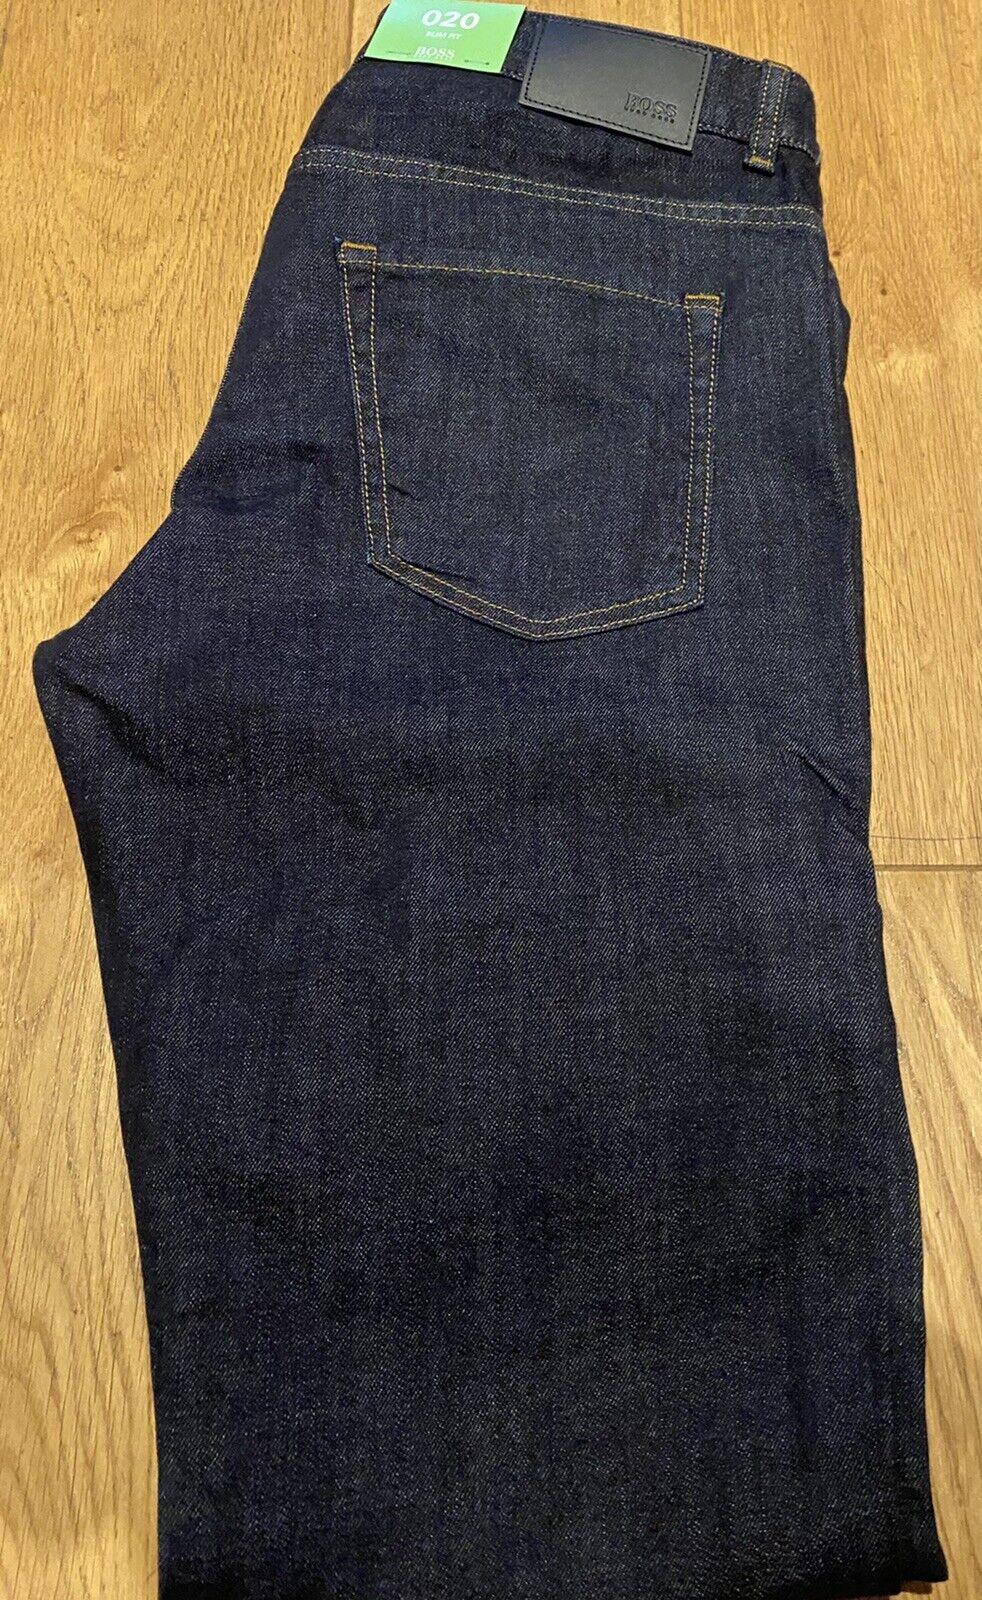 Hugo Boss JC. Delaware 1  Slim Fit Hose Blau Jeans  W 34 L 34 NEU UVP 159€